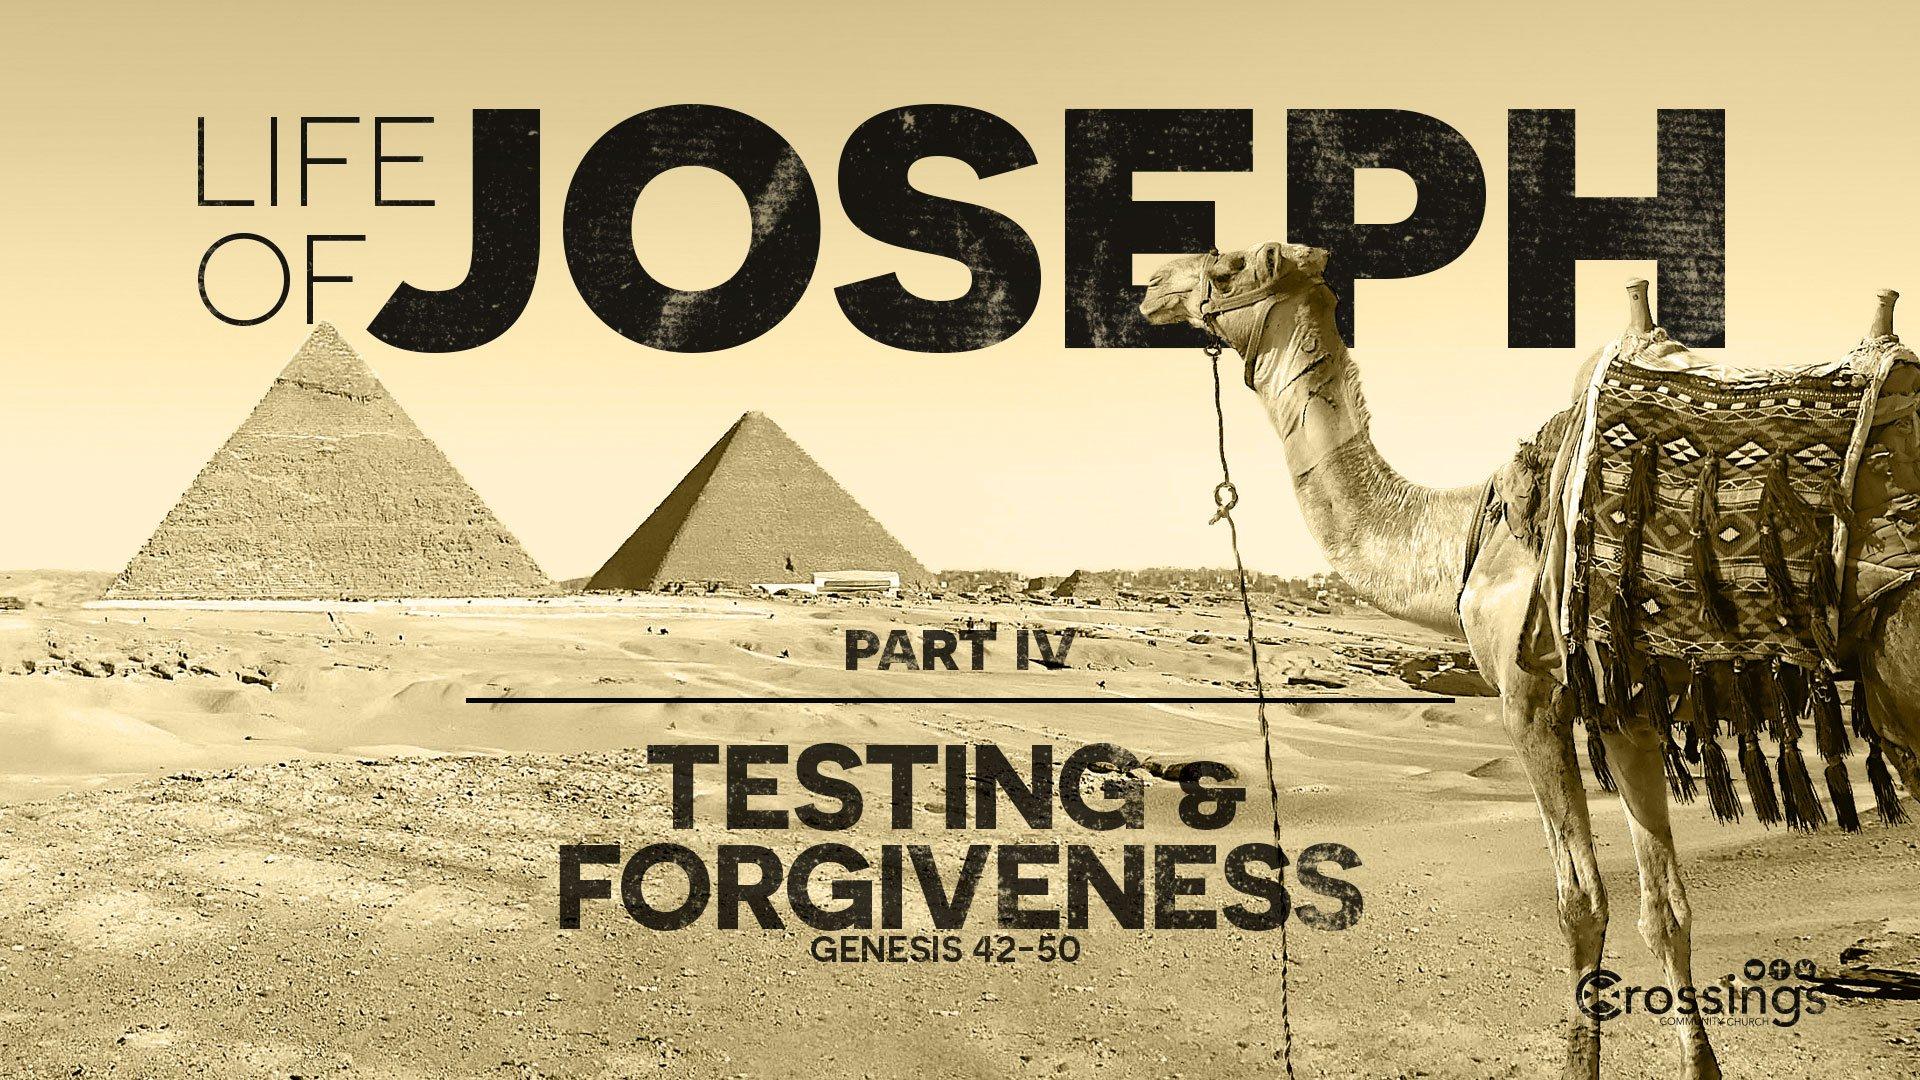 Forgiving those who wrong you